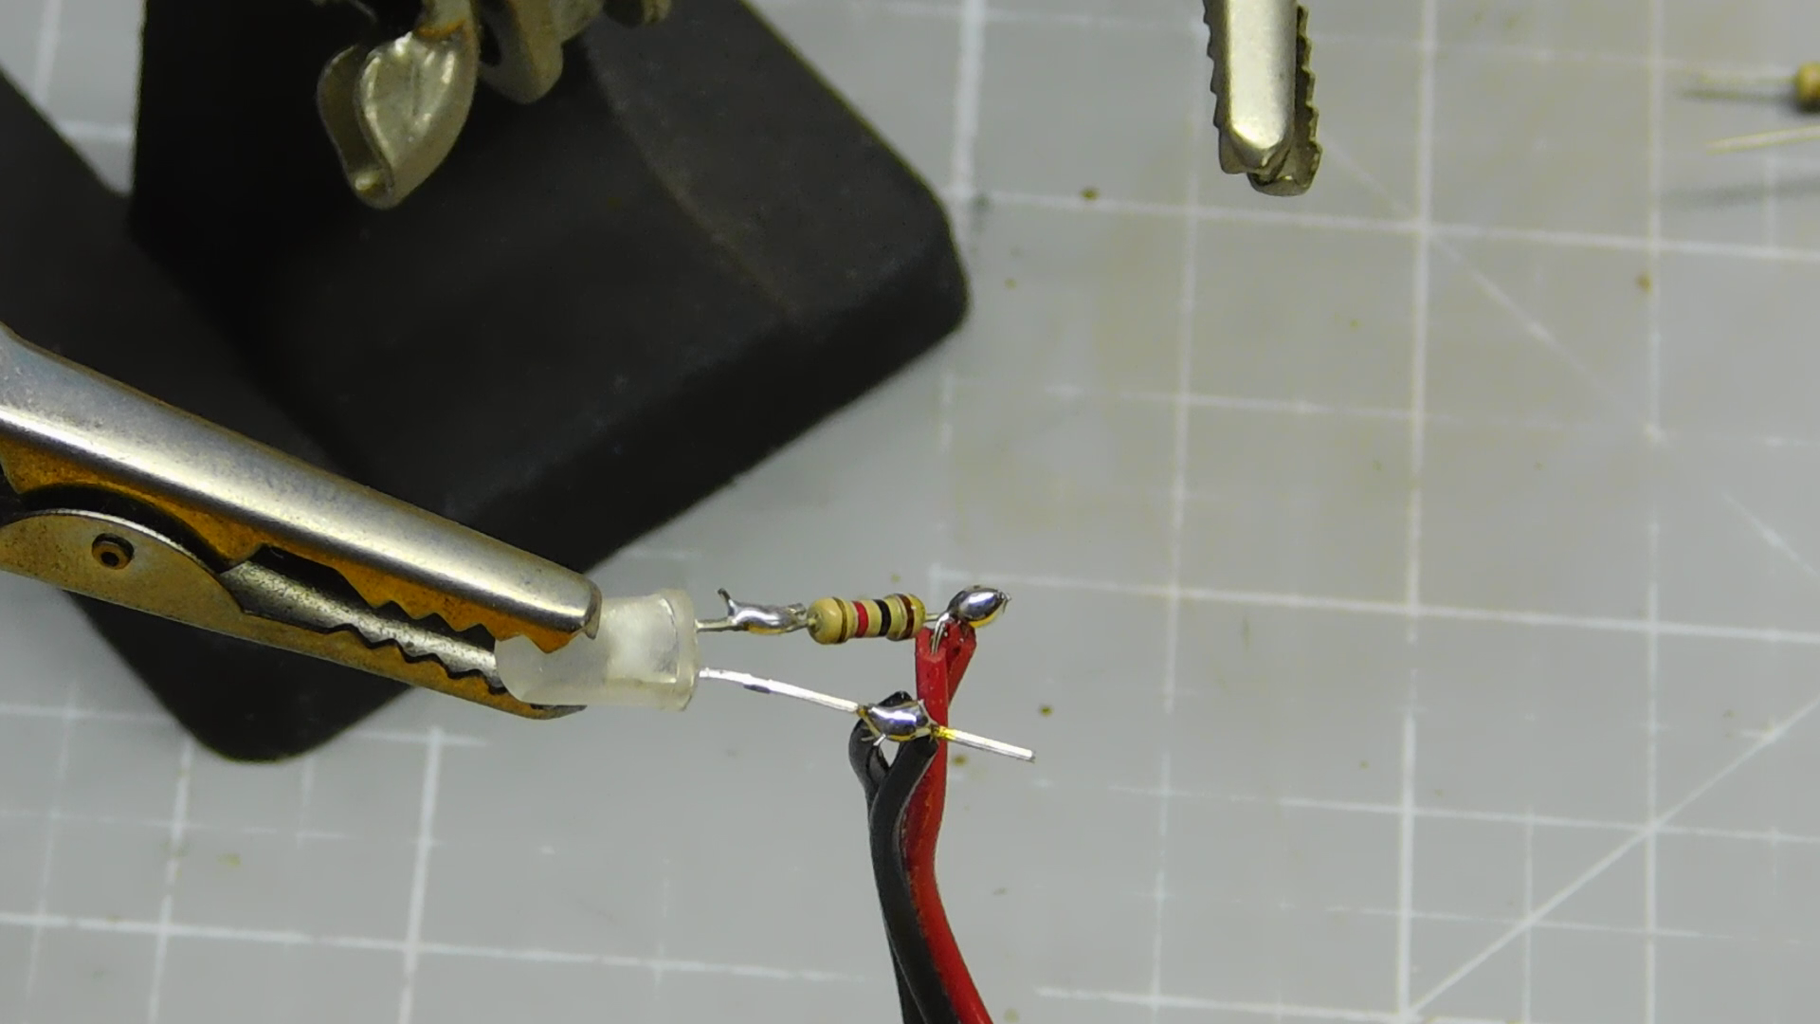 Add Some LEDs (Optional)